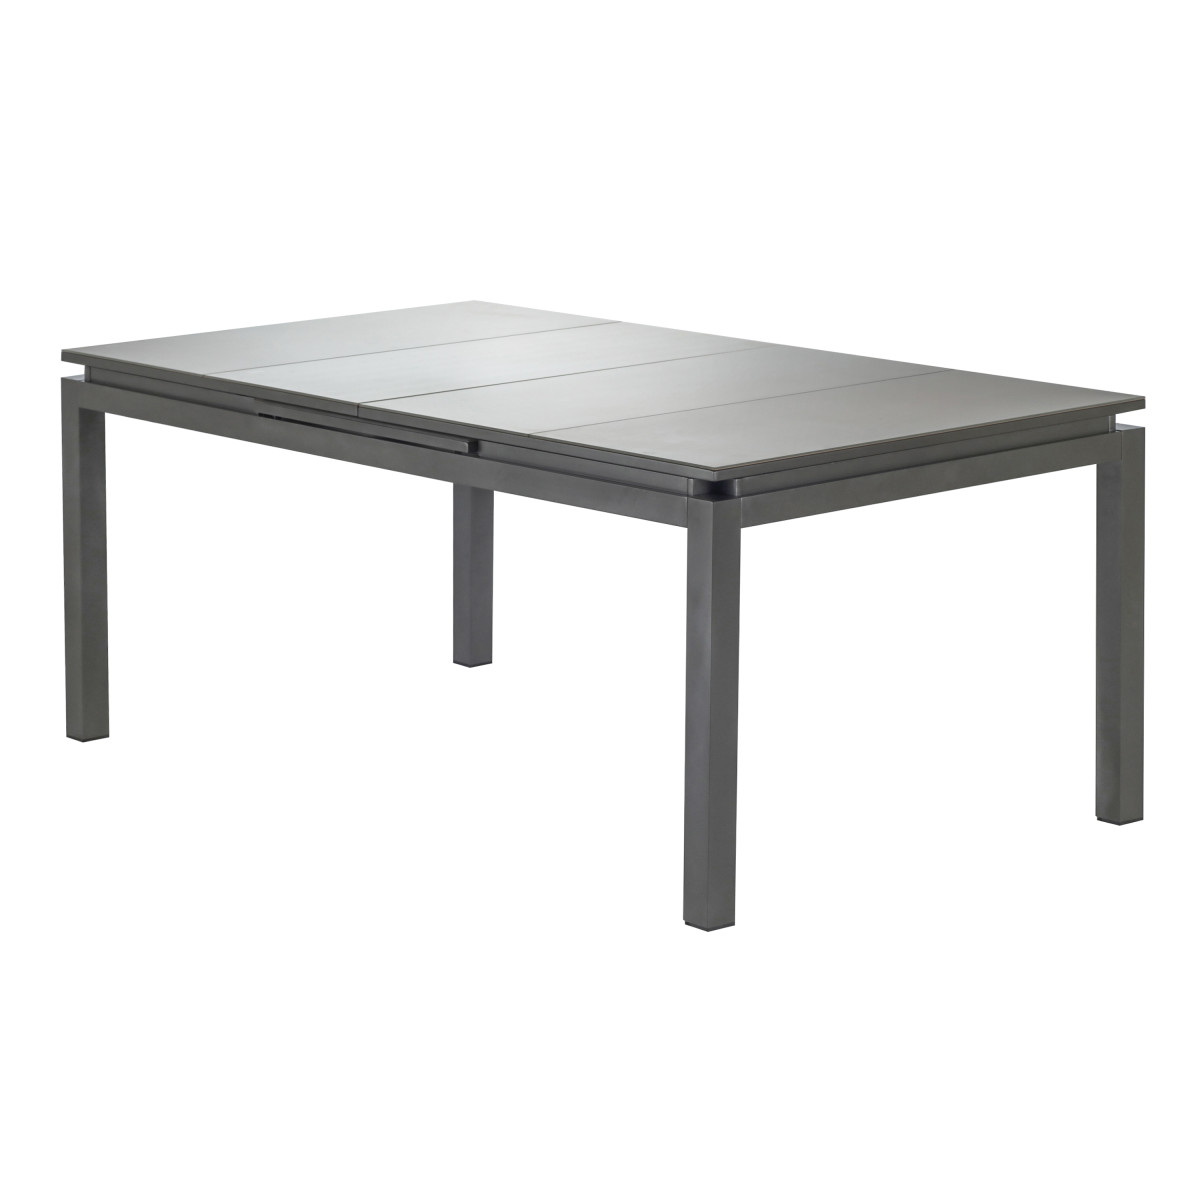 Стол садовый раздвижной Naterial Odissea Easy 180-240х90х76.5 см алюминий коричневый